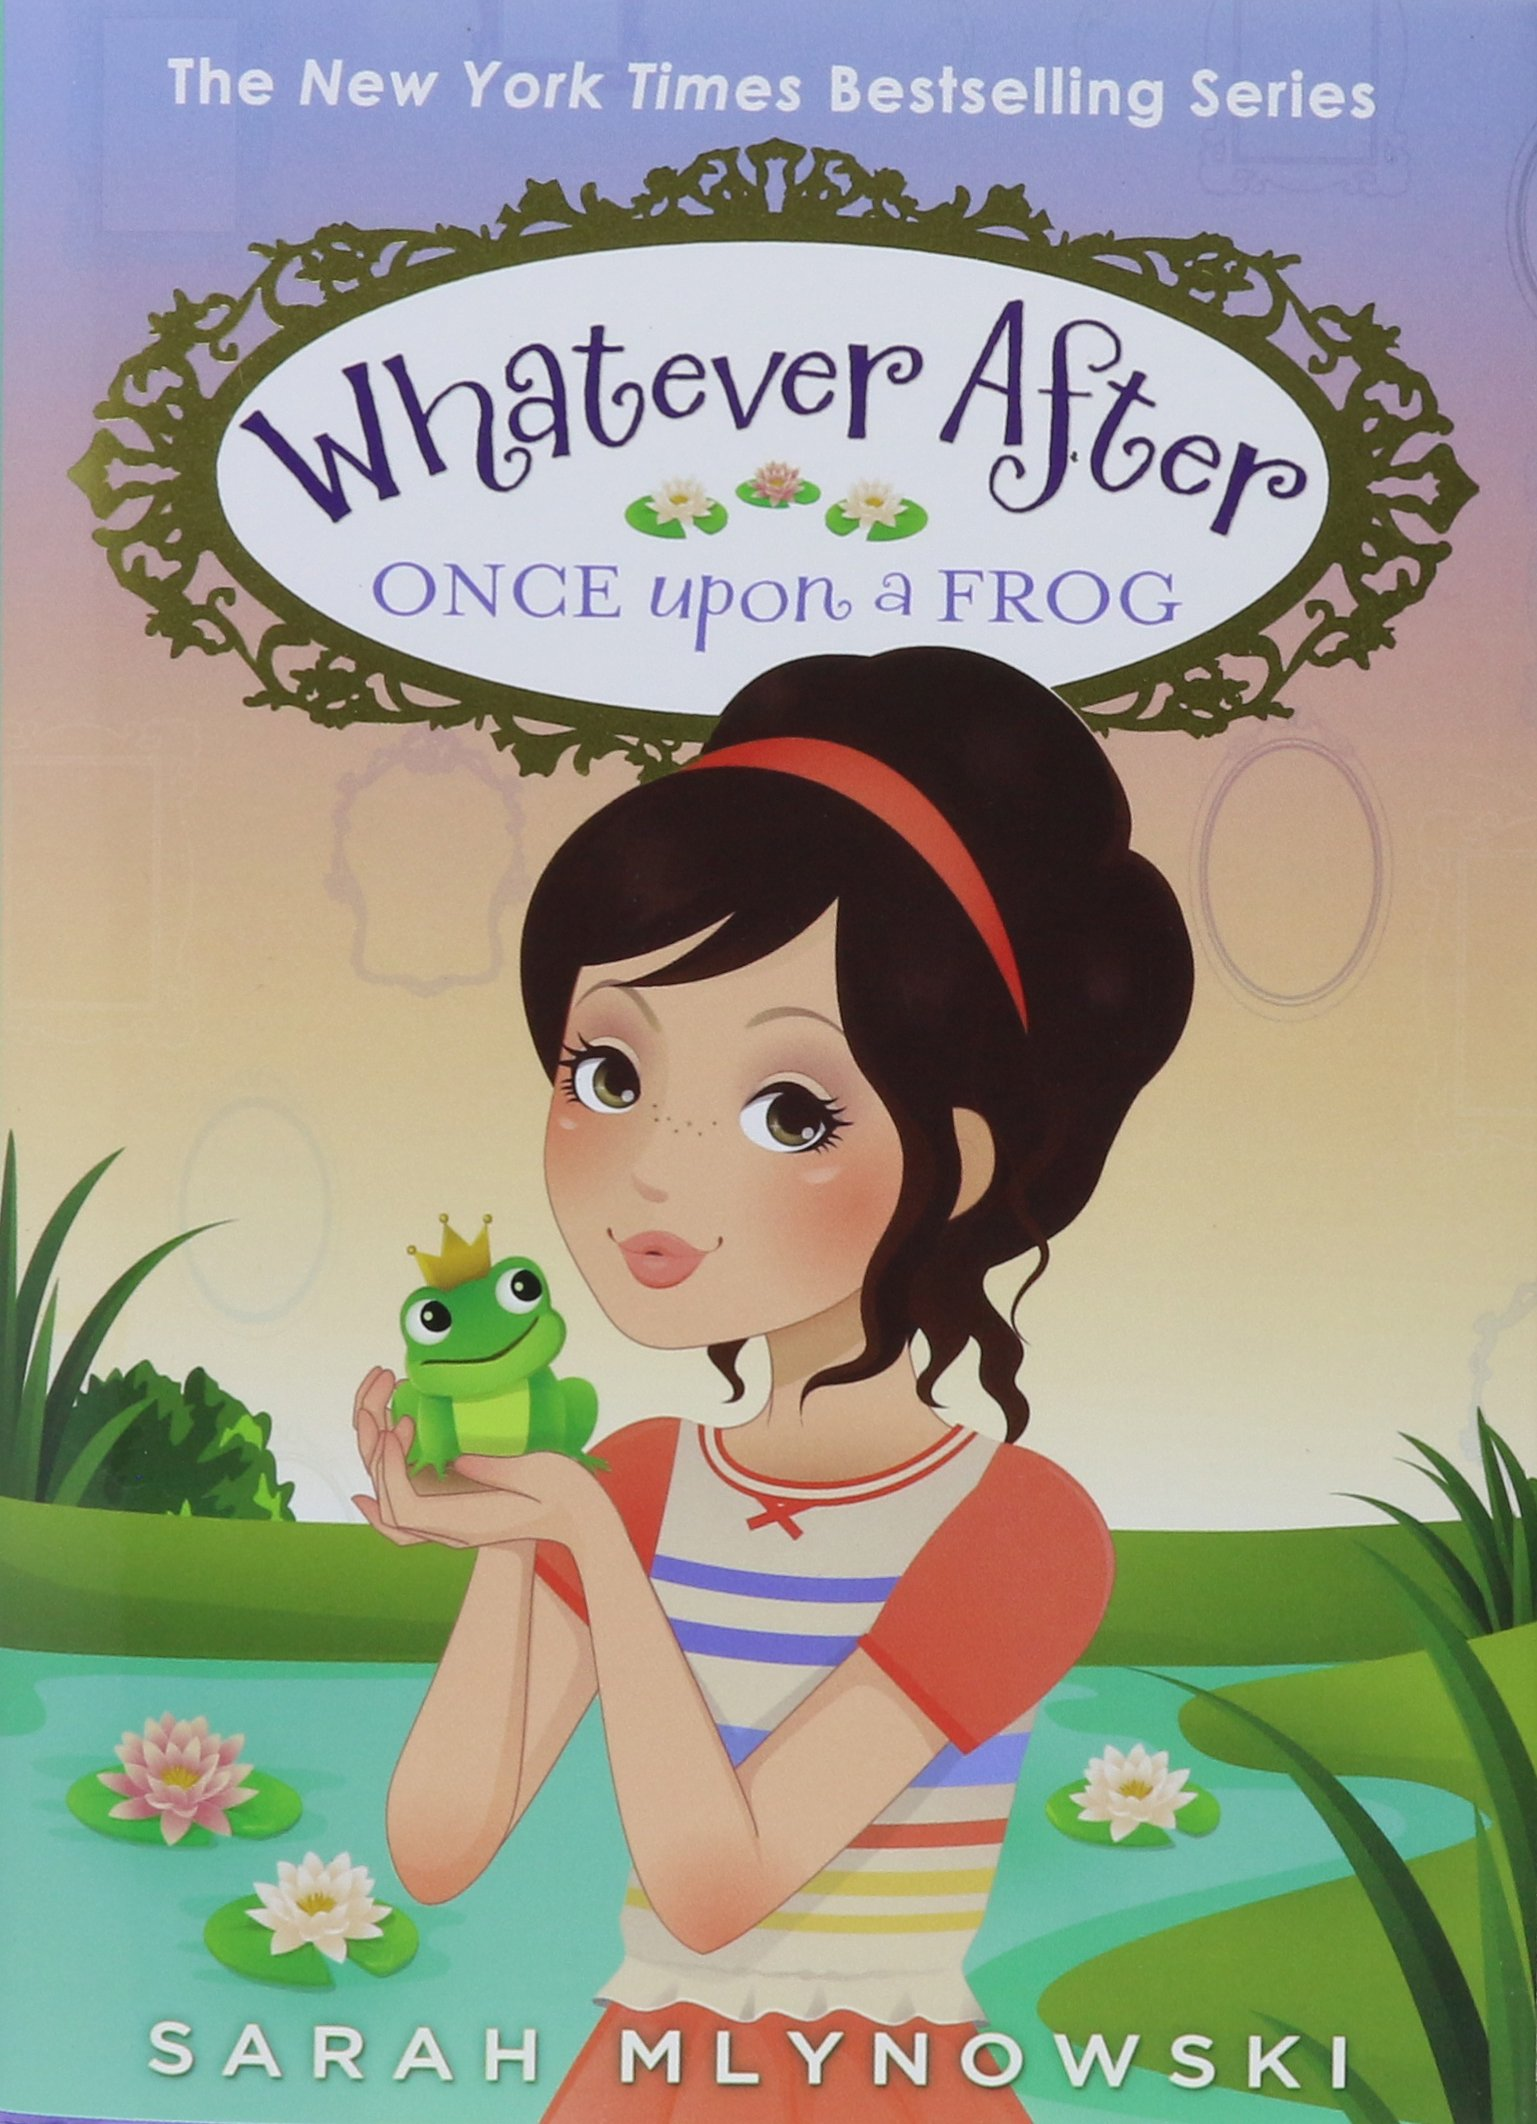 sarah-mlynowski-whatever-after-once-upon-frog.jpg